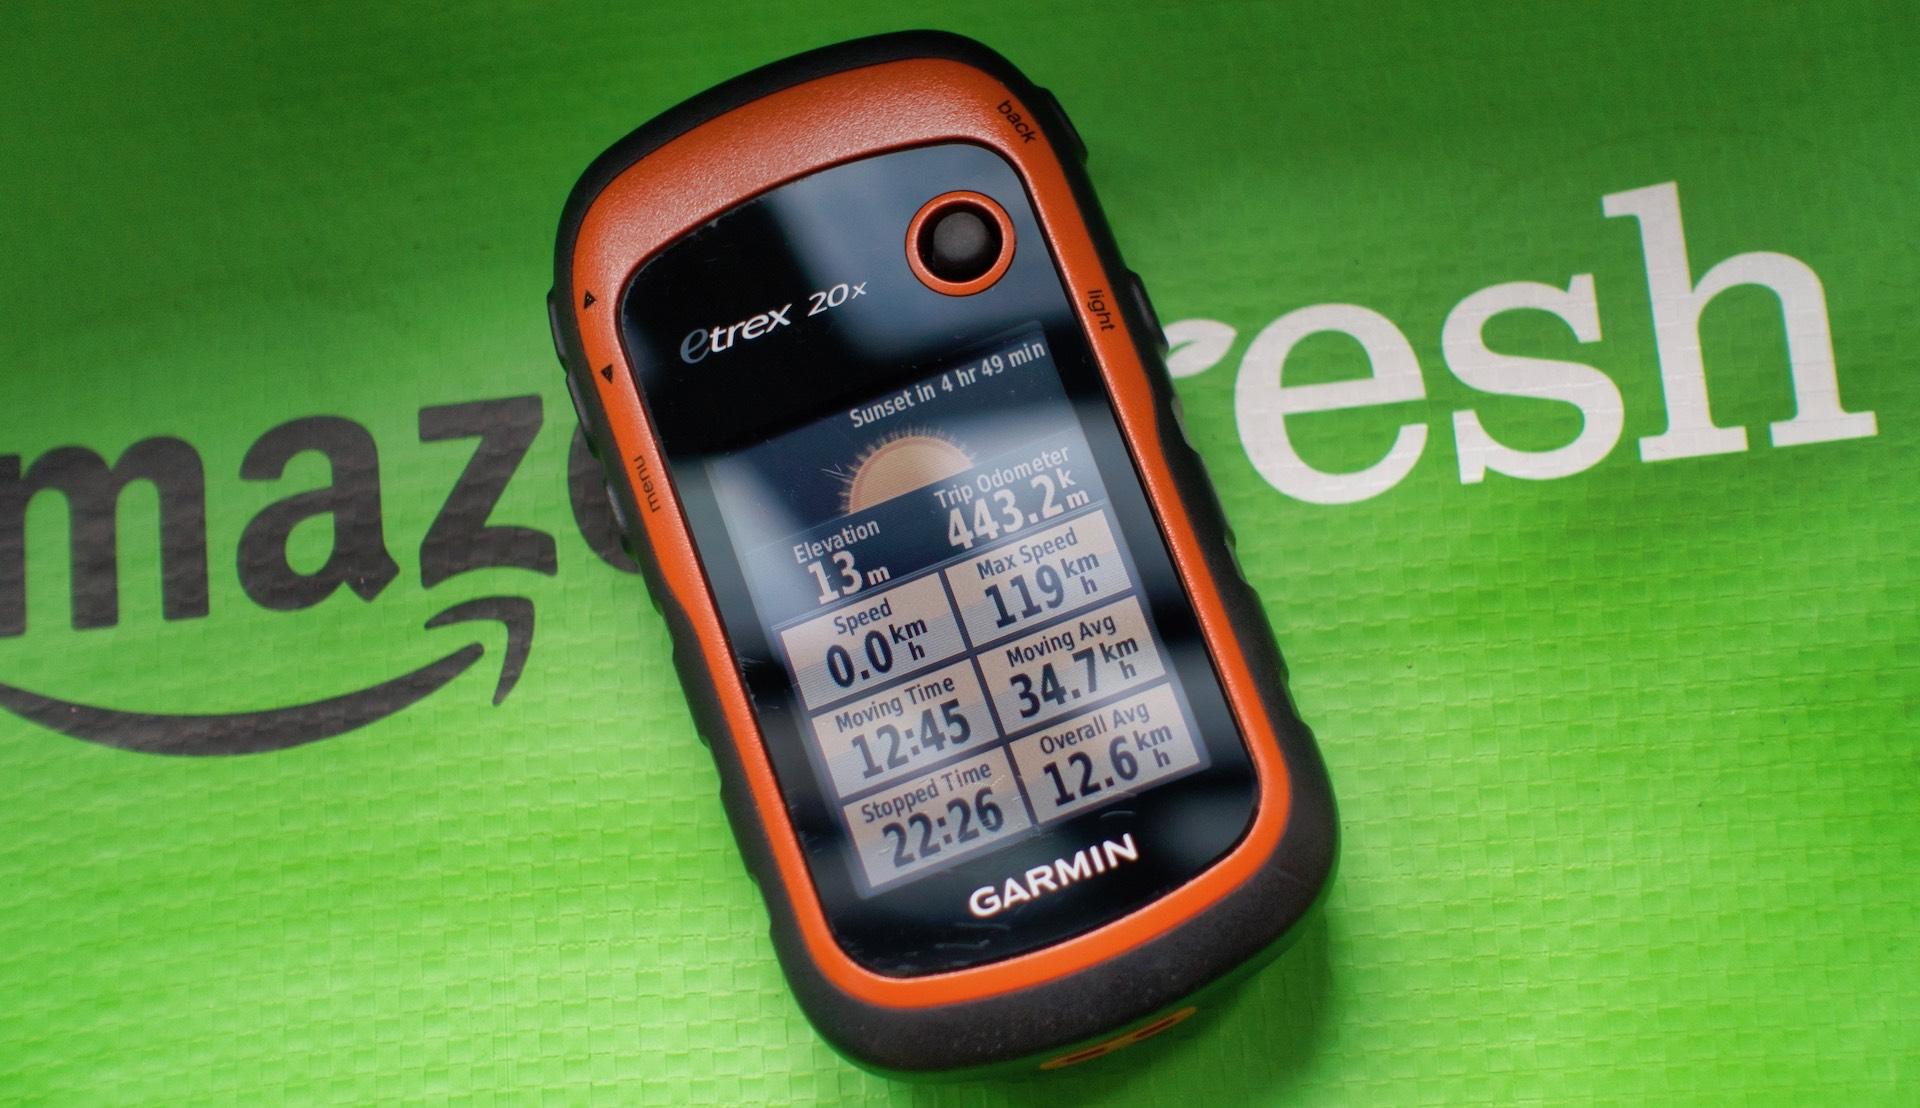 Speed up the map updates on a Garmin eTrix 20x – Rienk Jan